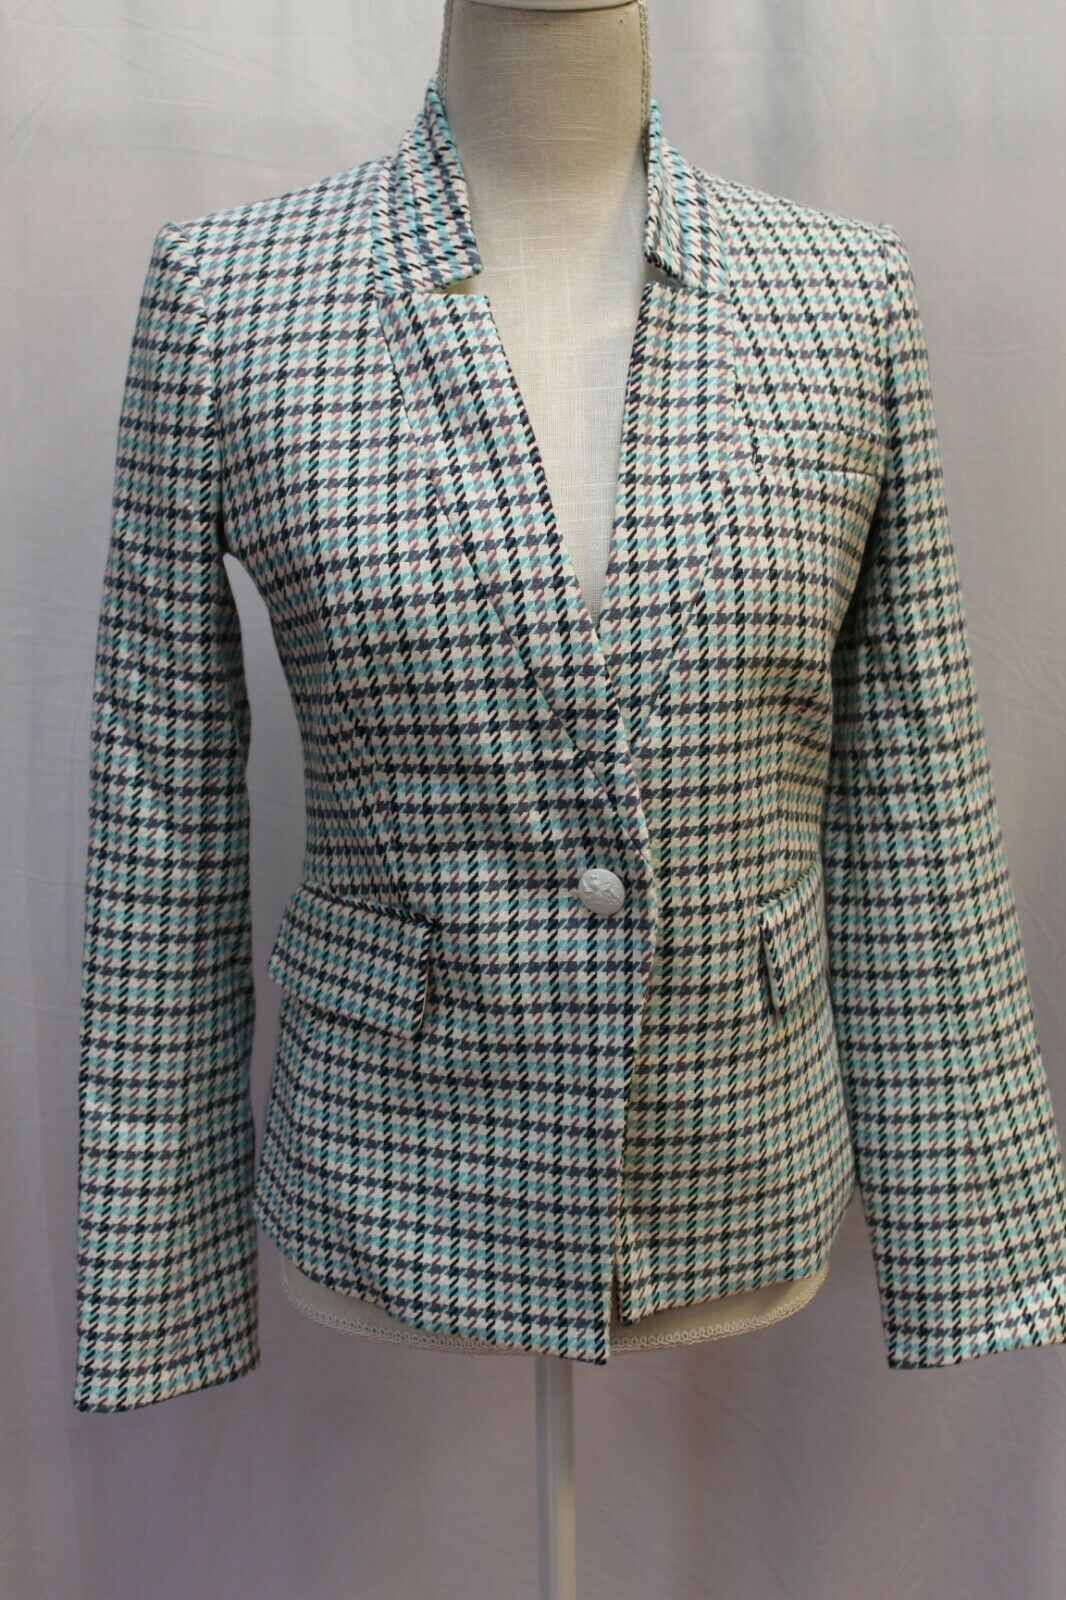 NWT VERONICA BEARD Farley Dickey Jacket Coat Blazer Turquoise 4 Small